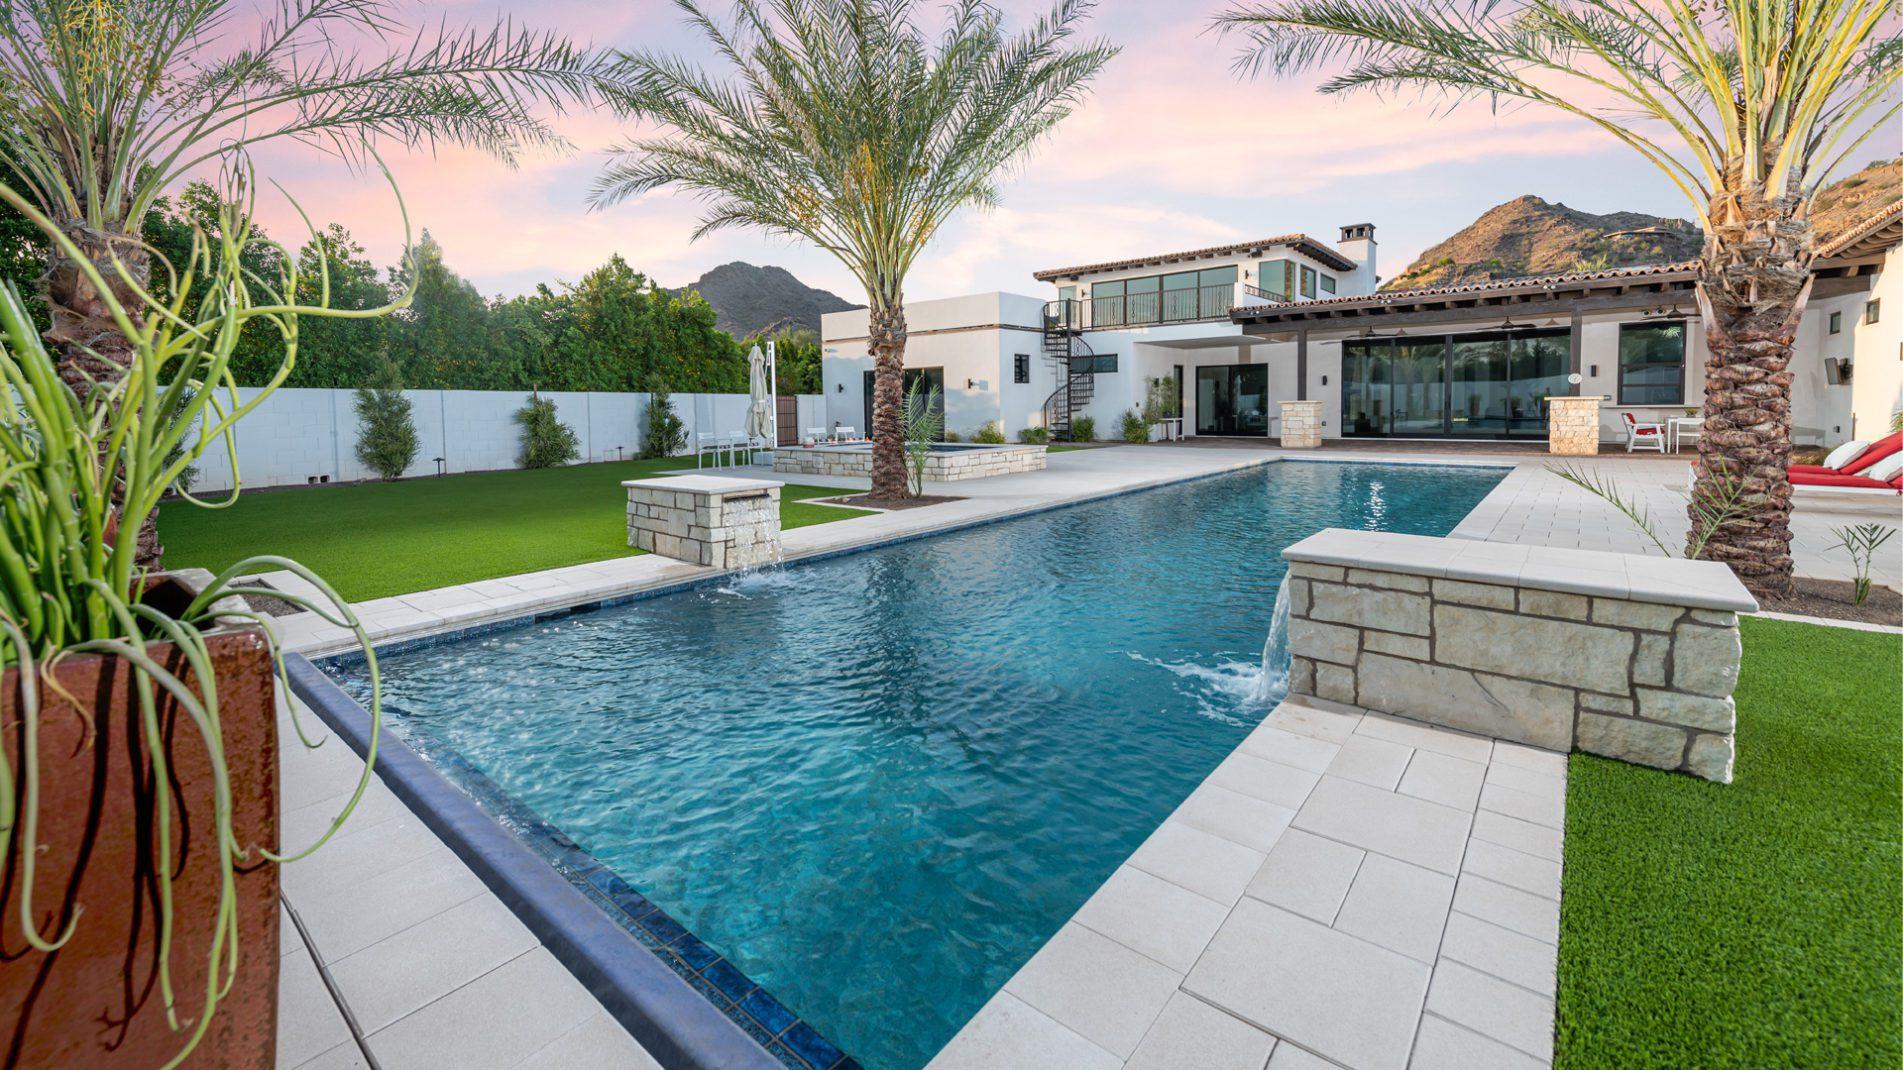 Pool Laps In Paradise